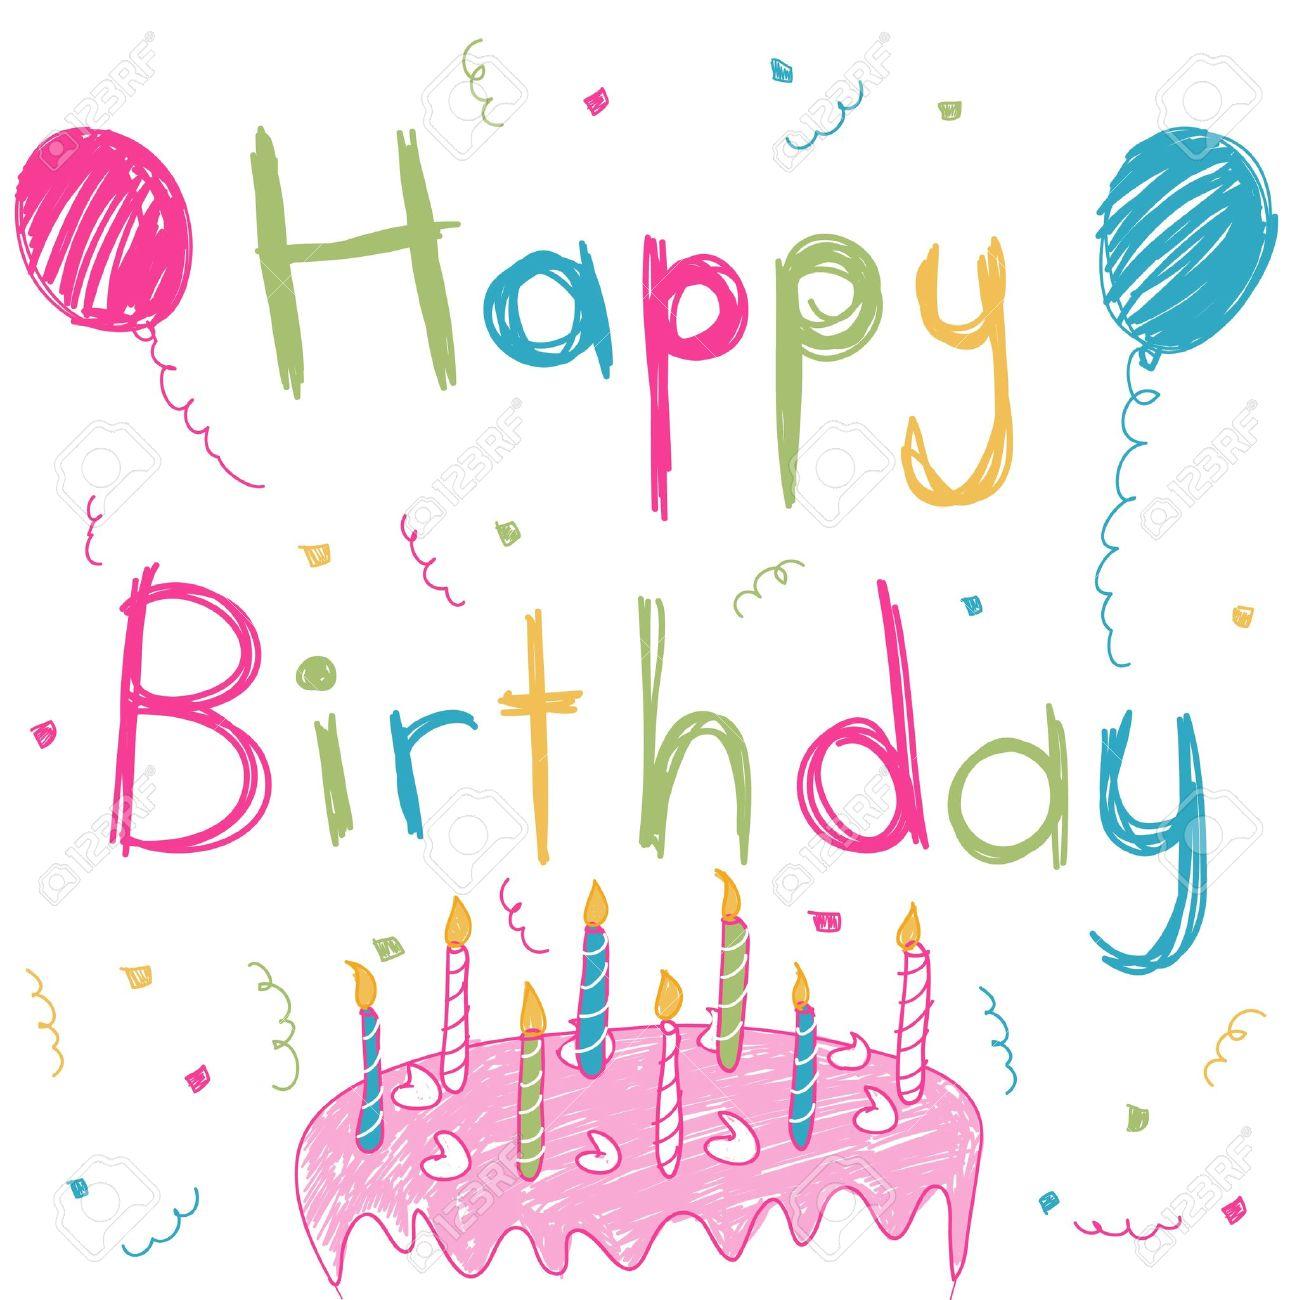 happy birthday card royalty free cliparts, vectors, and stock, Birthday card